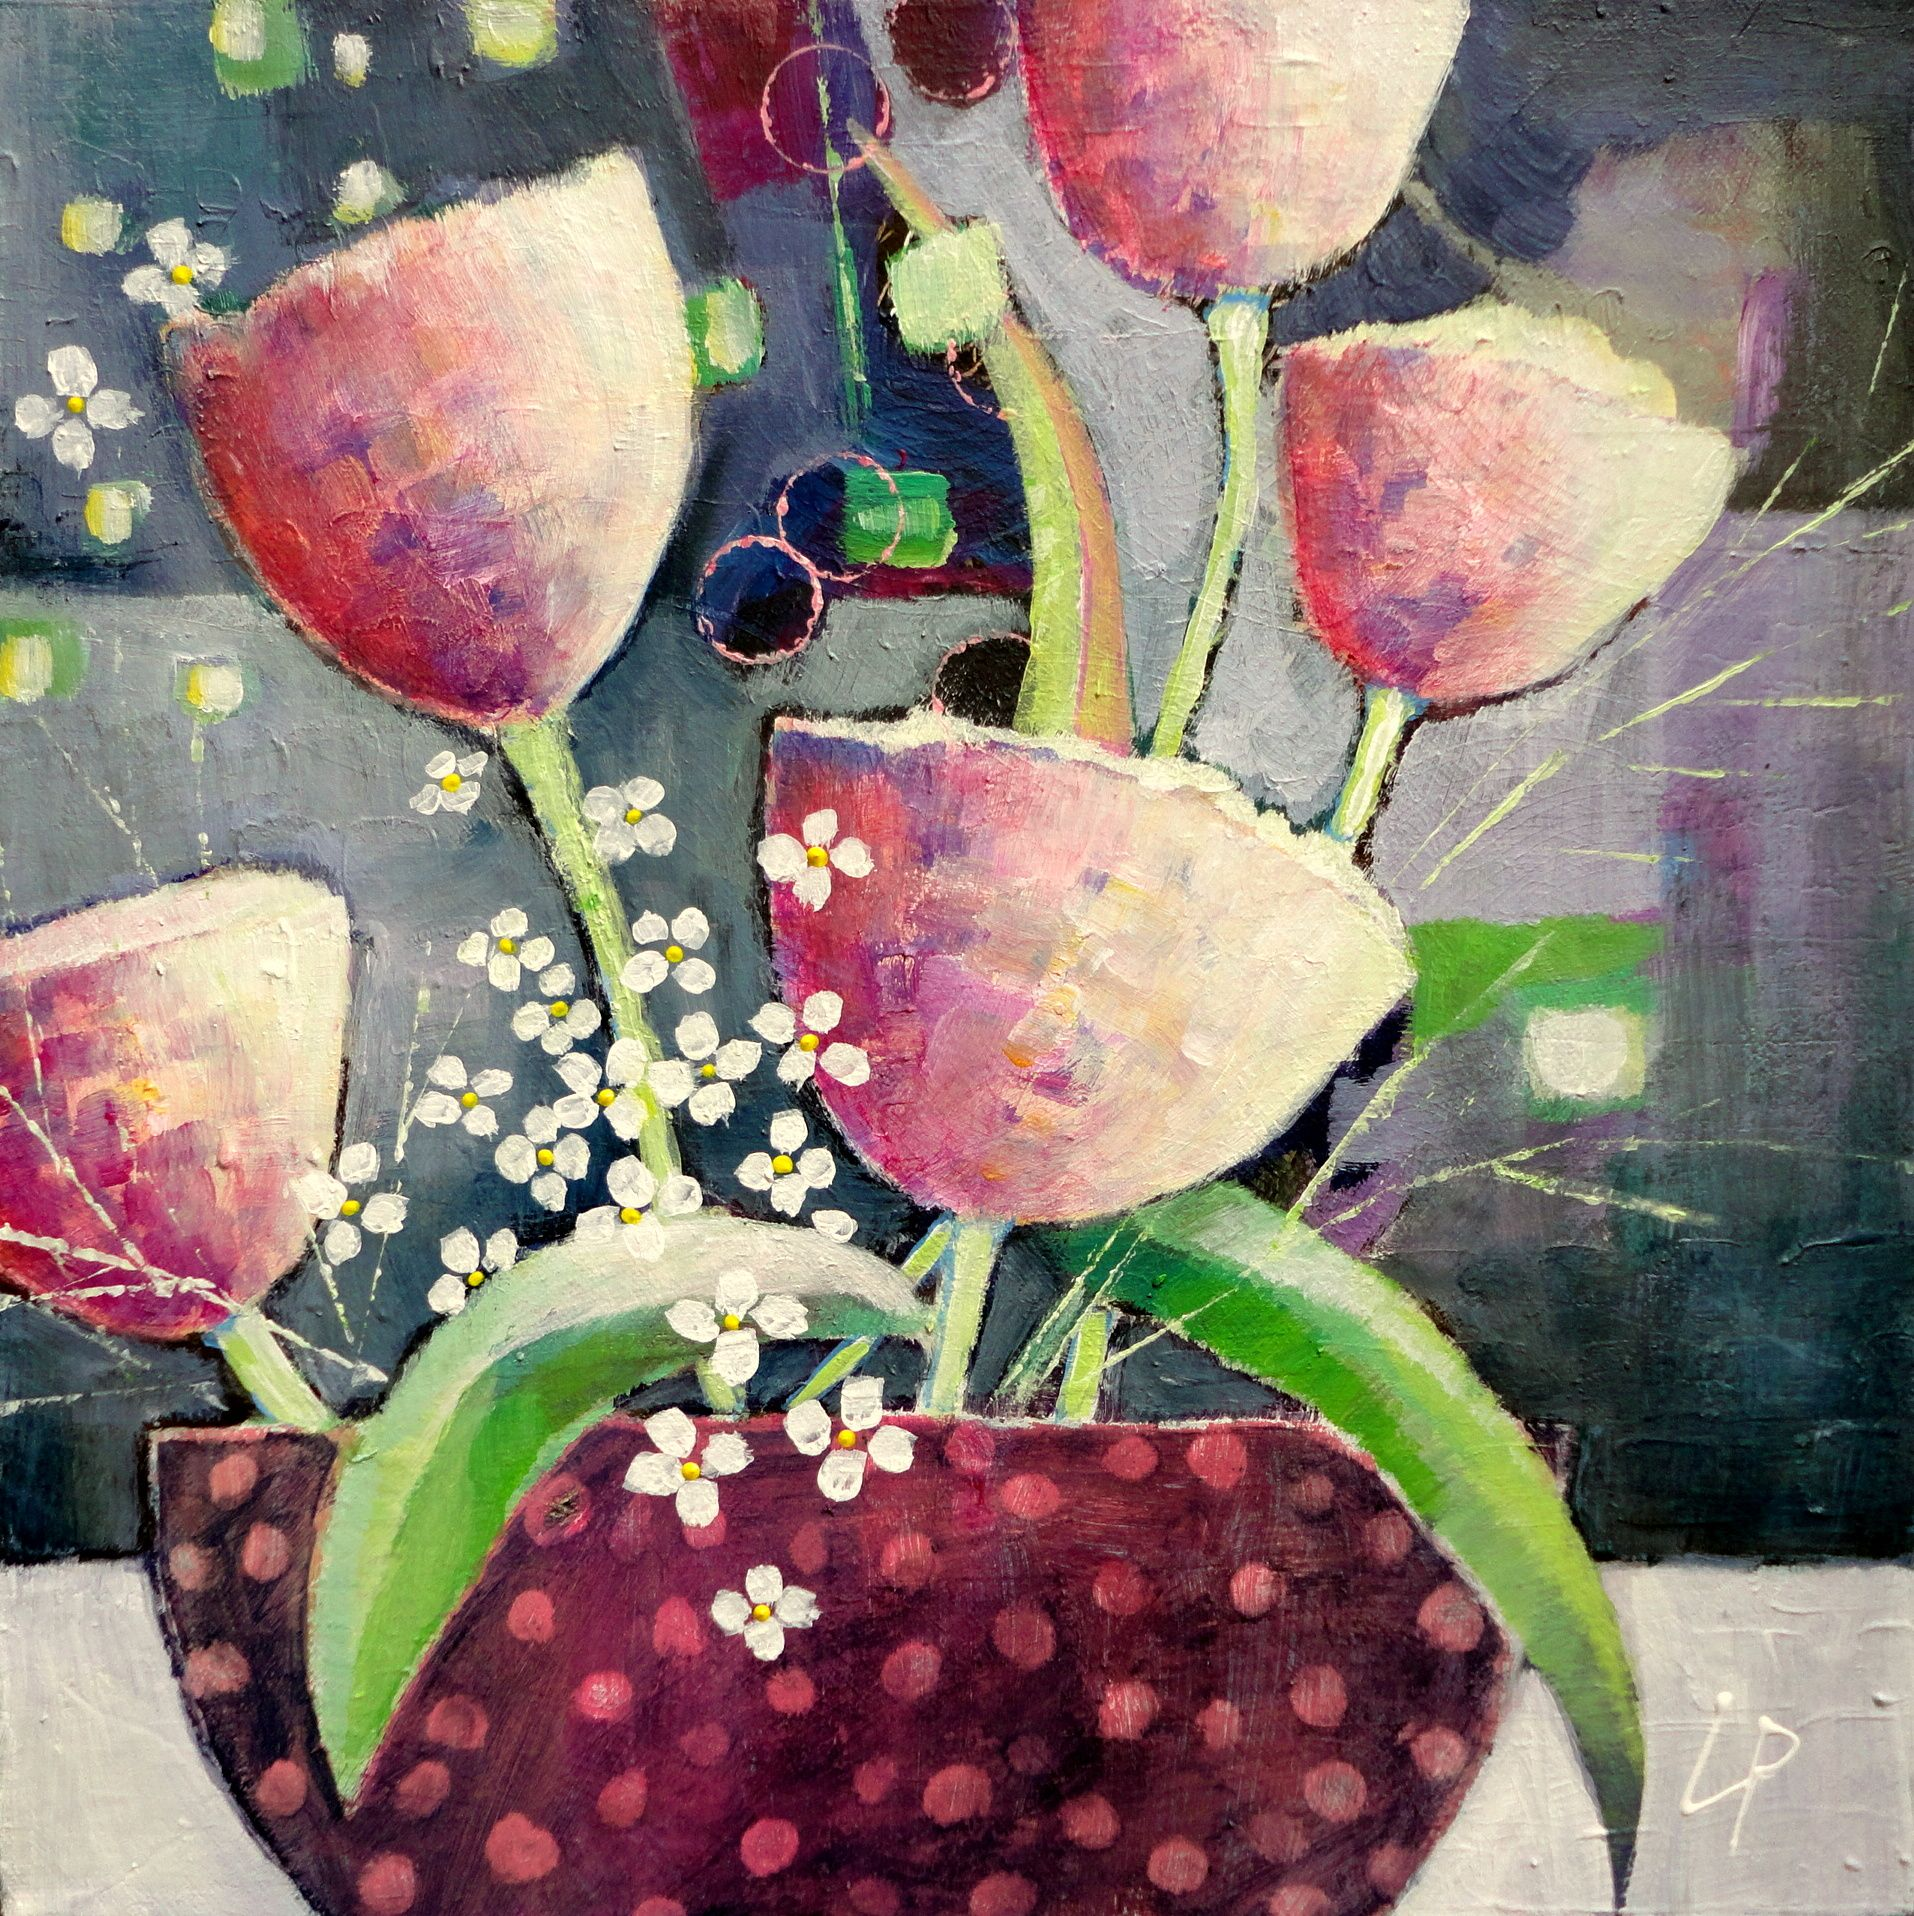 acryl auf leinwand 40 x 40 youtube gerda lipski flowers pinterest. Black Bedroom Furniture Sets. Home Design Ideas